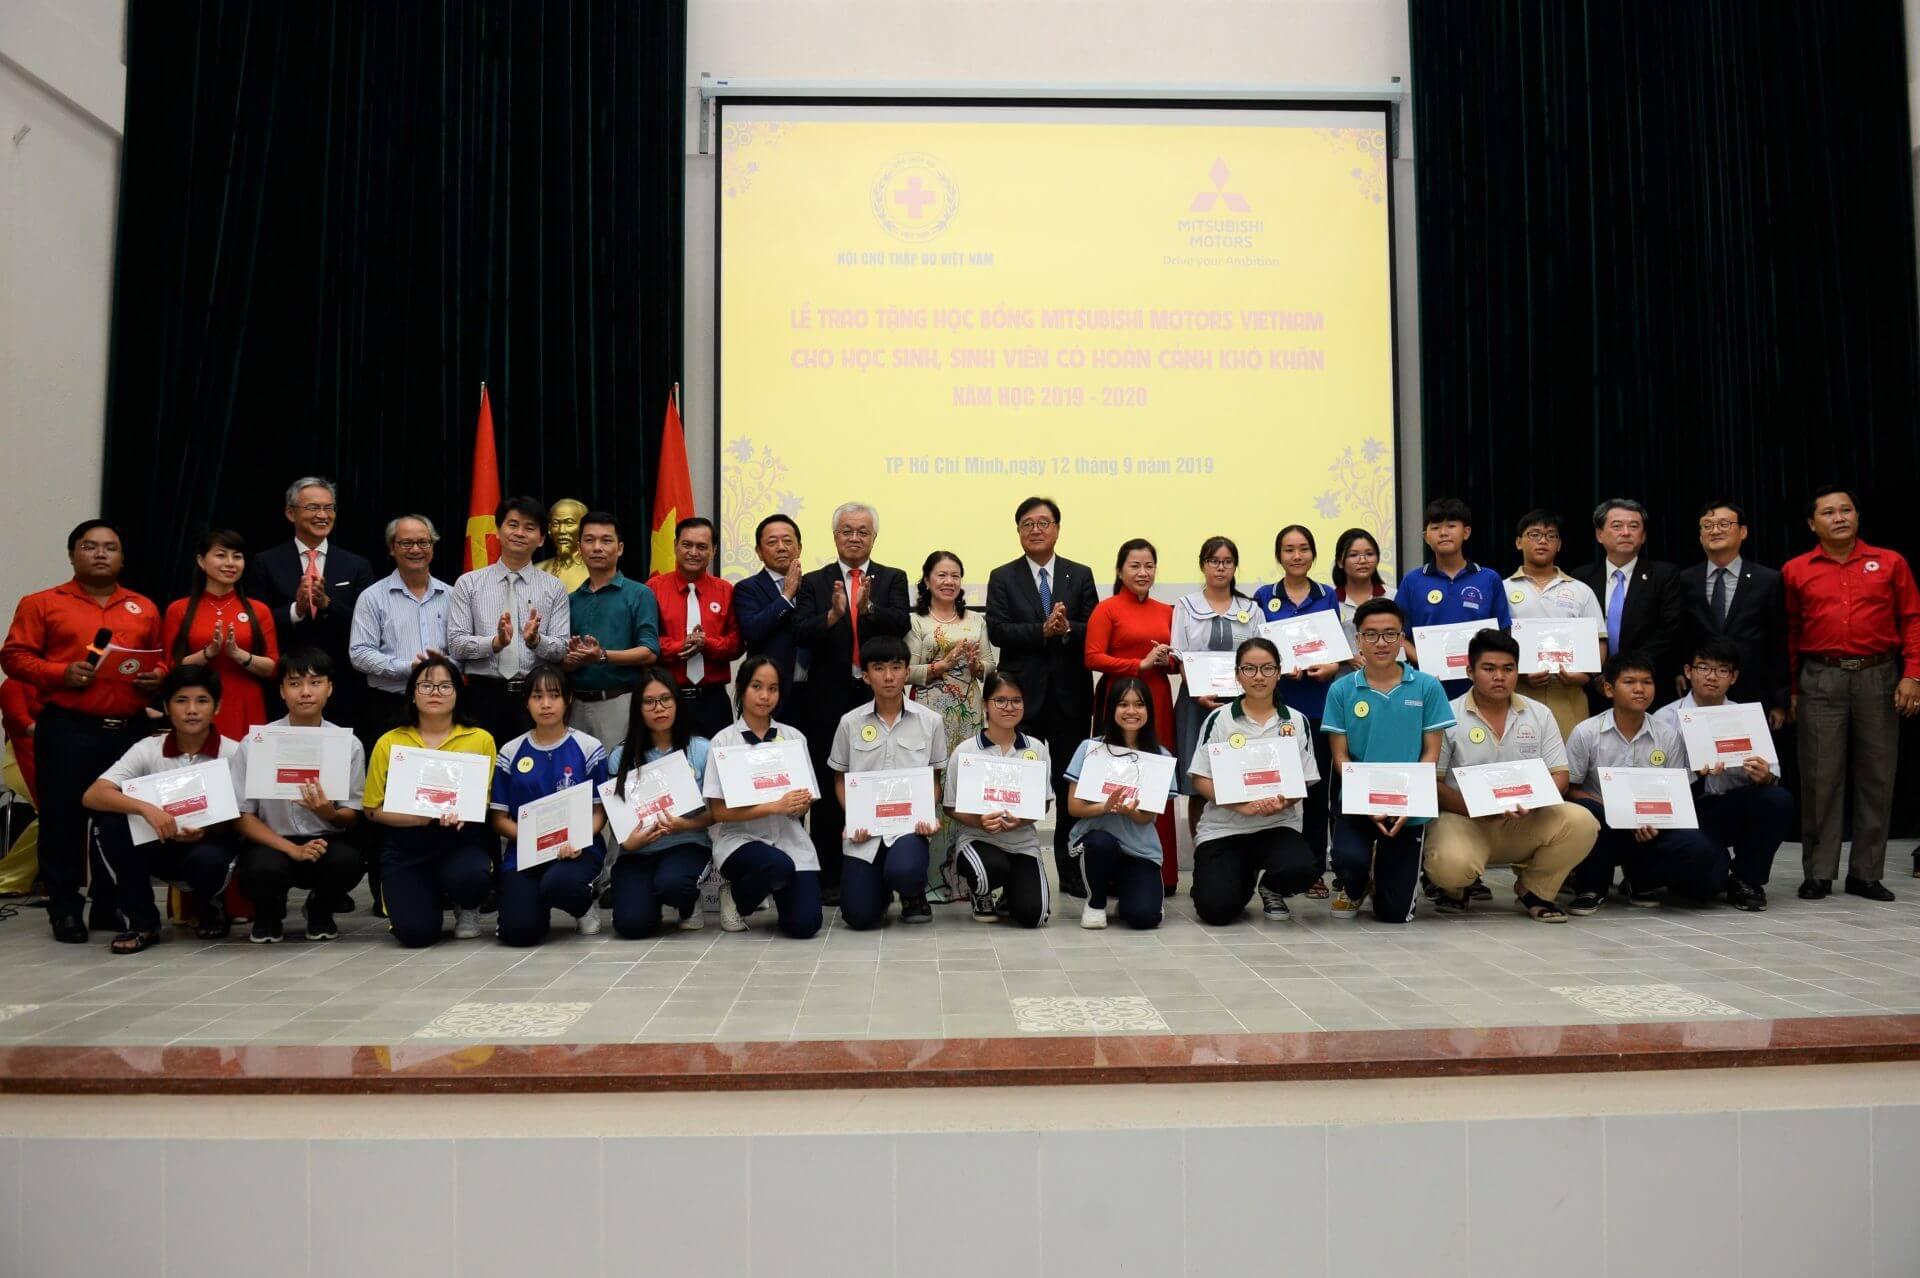 MITSUBISHI MOTORS VIETNAM AWARDS 70 SCHOLARSHIPS TO POOR STUDENTS IN HCMC AND BINH DUONG PROVINCE